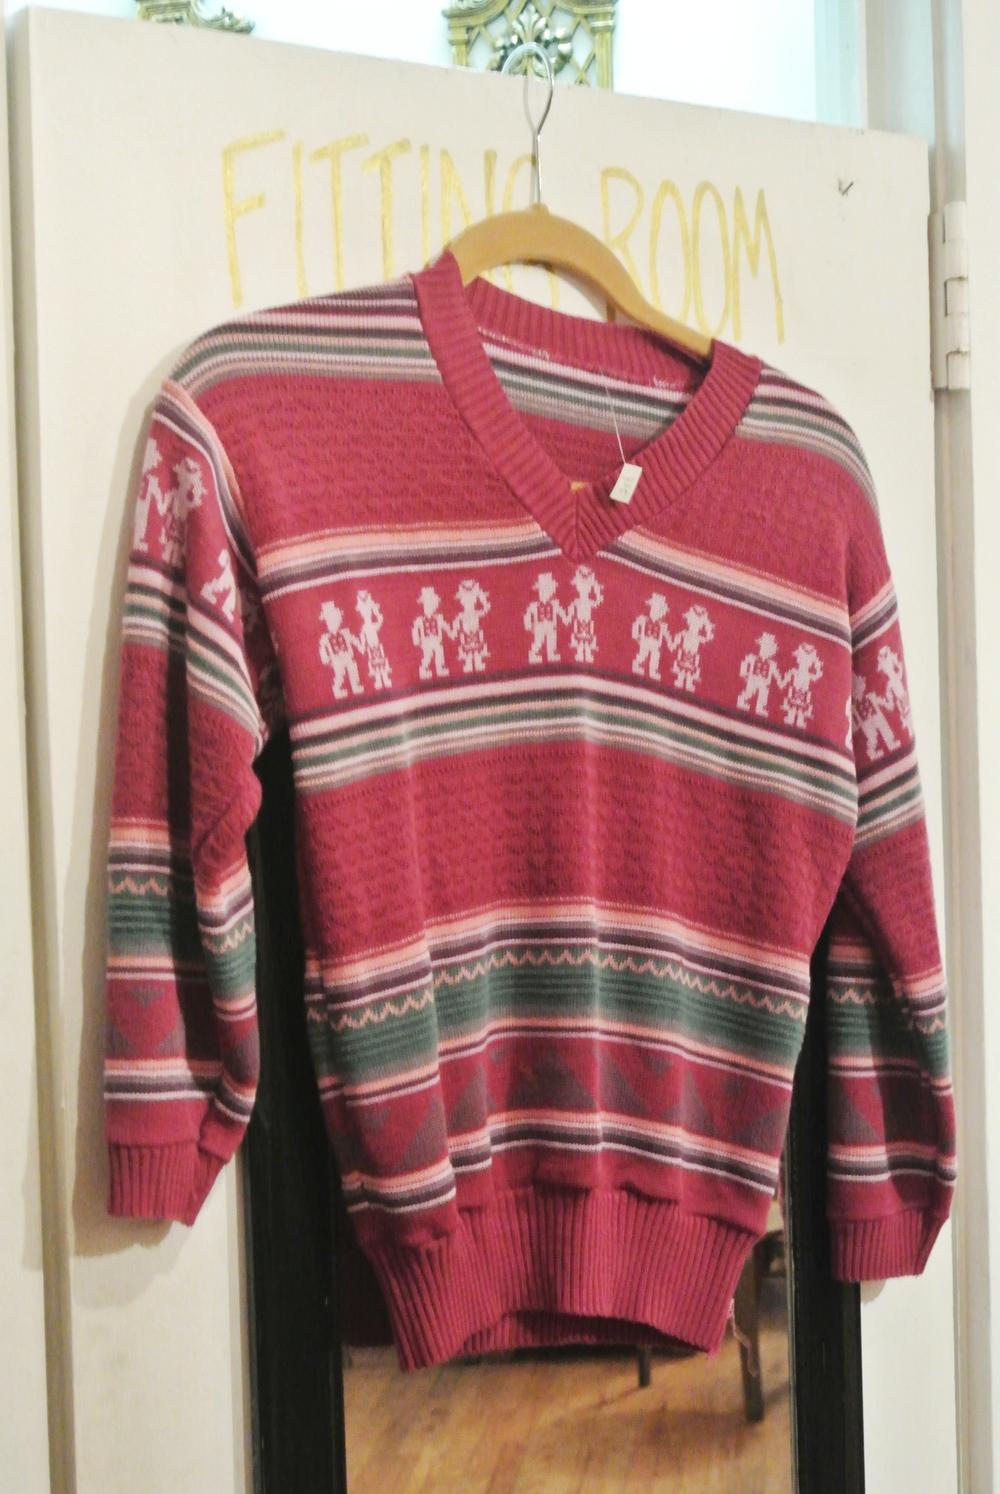 Vintage sweater, $13